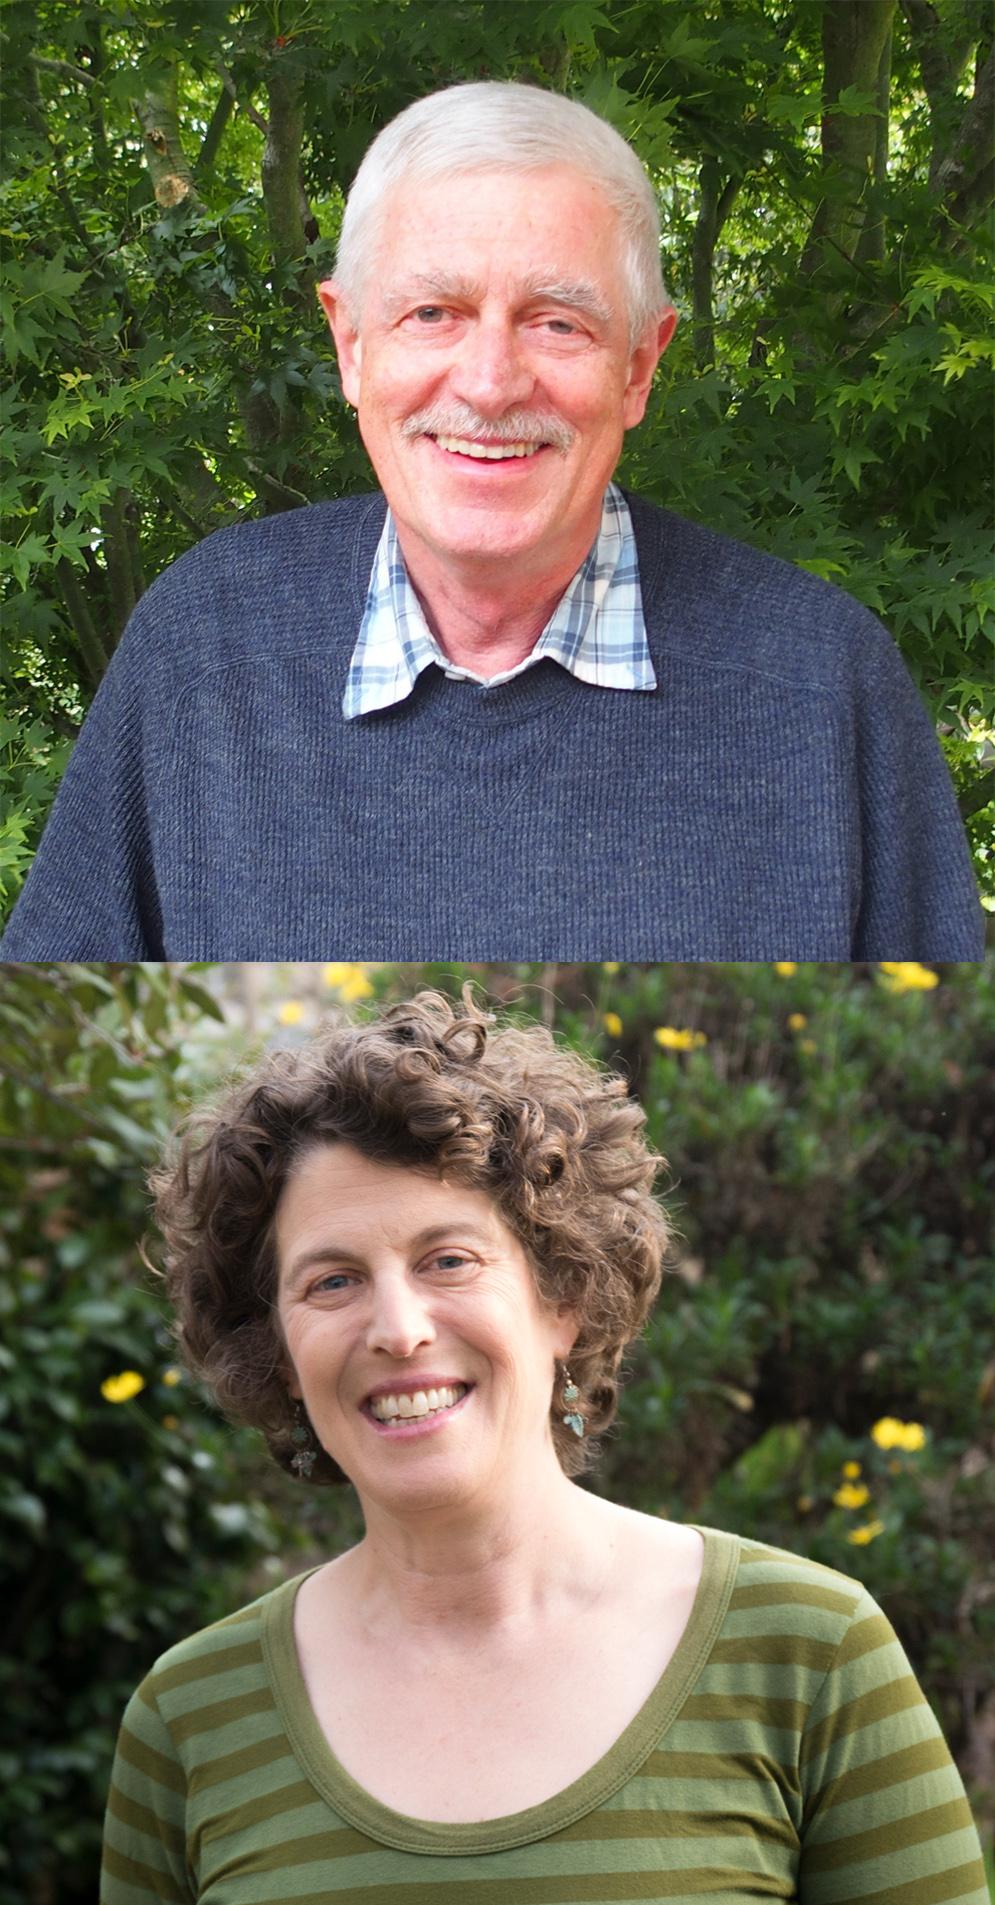 Robert e. Johnson and Janet L. Byron